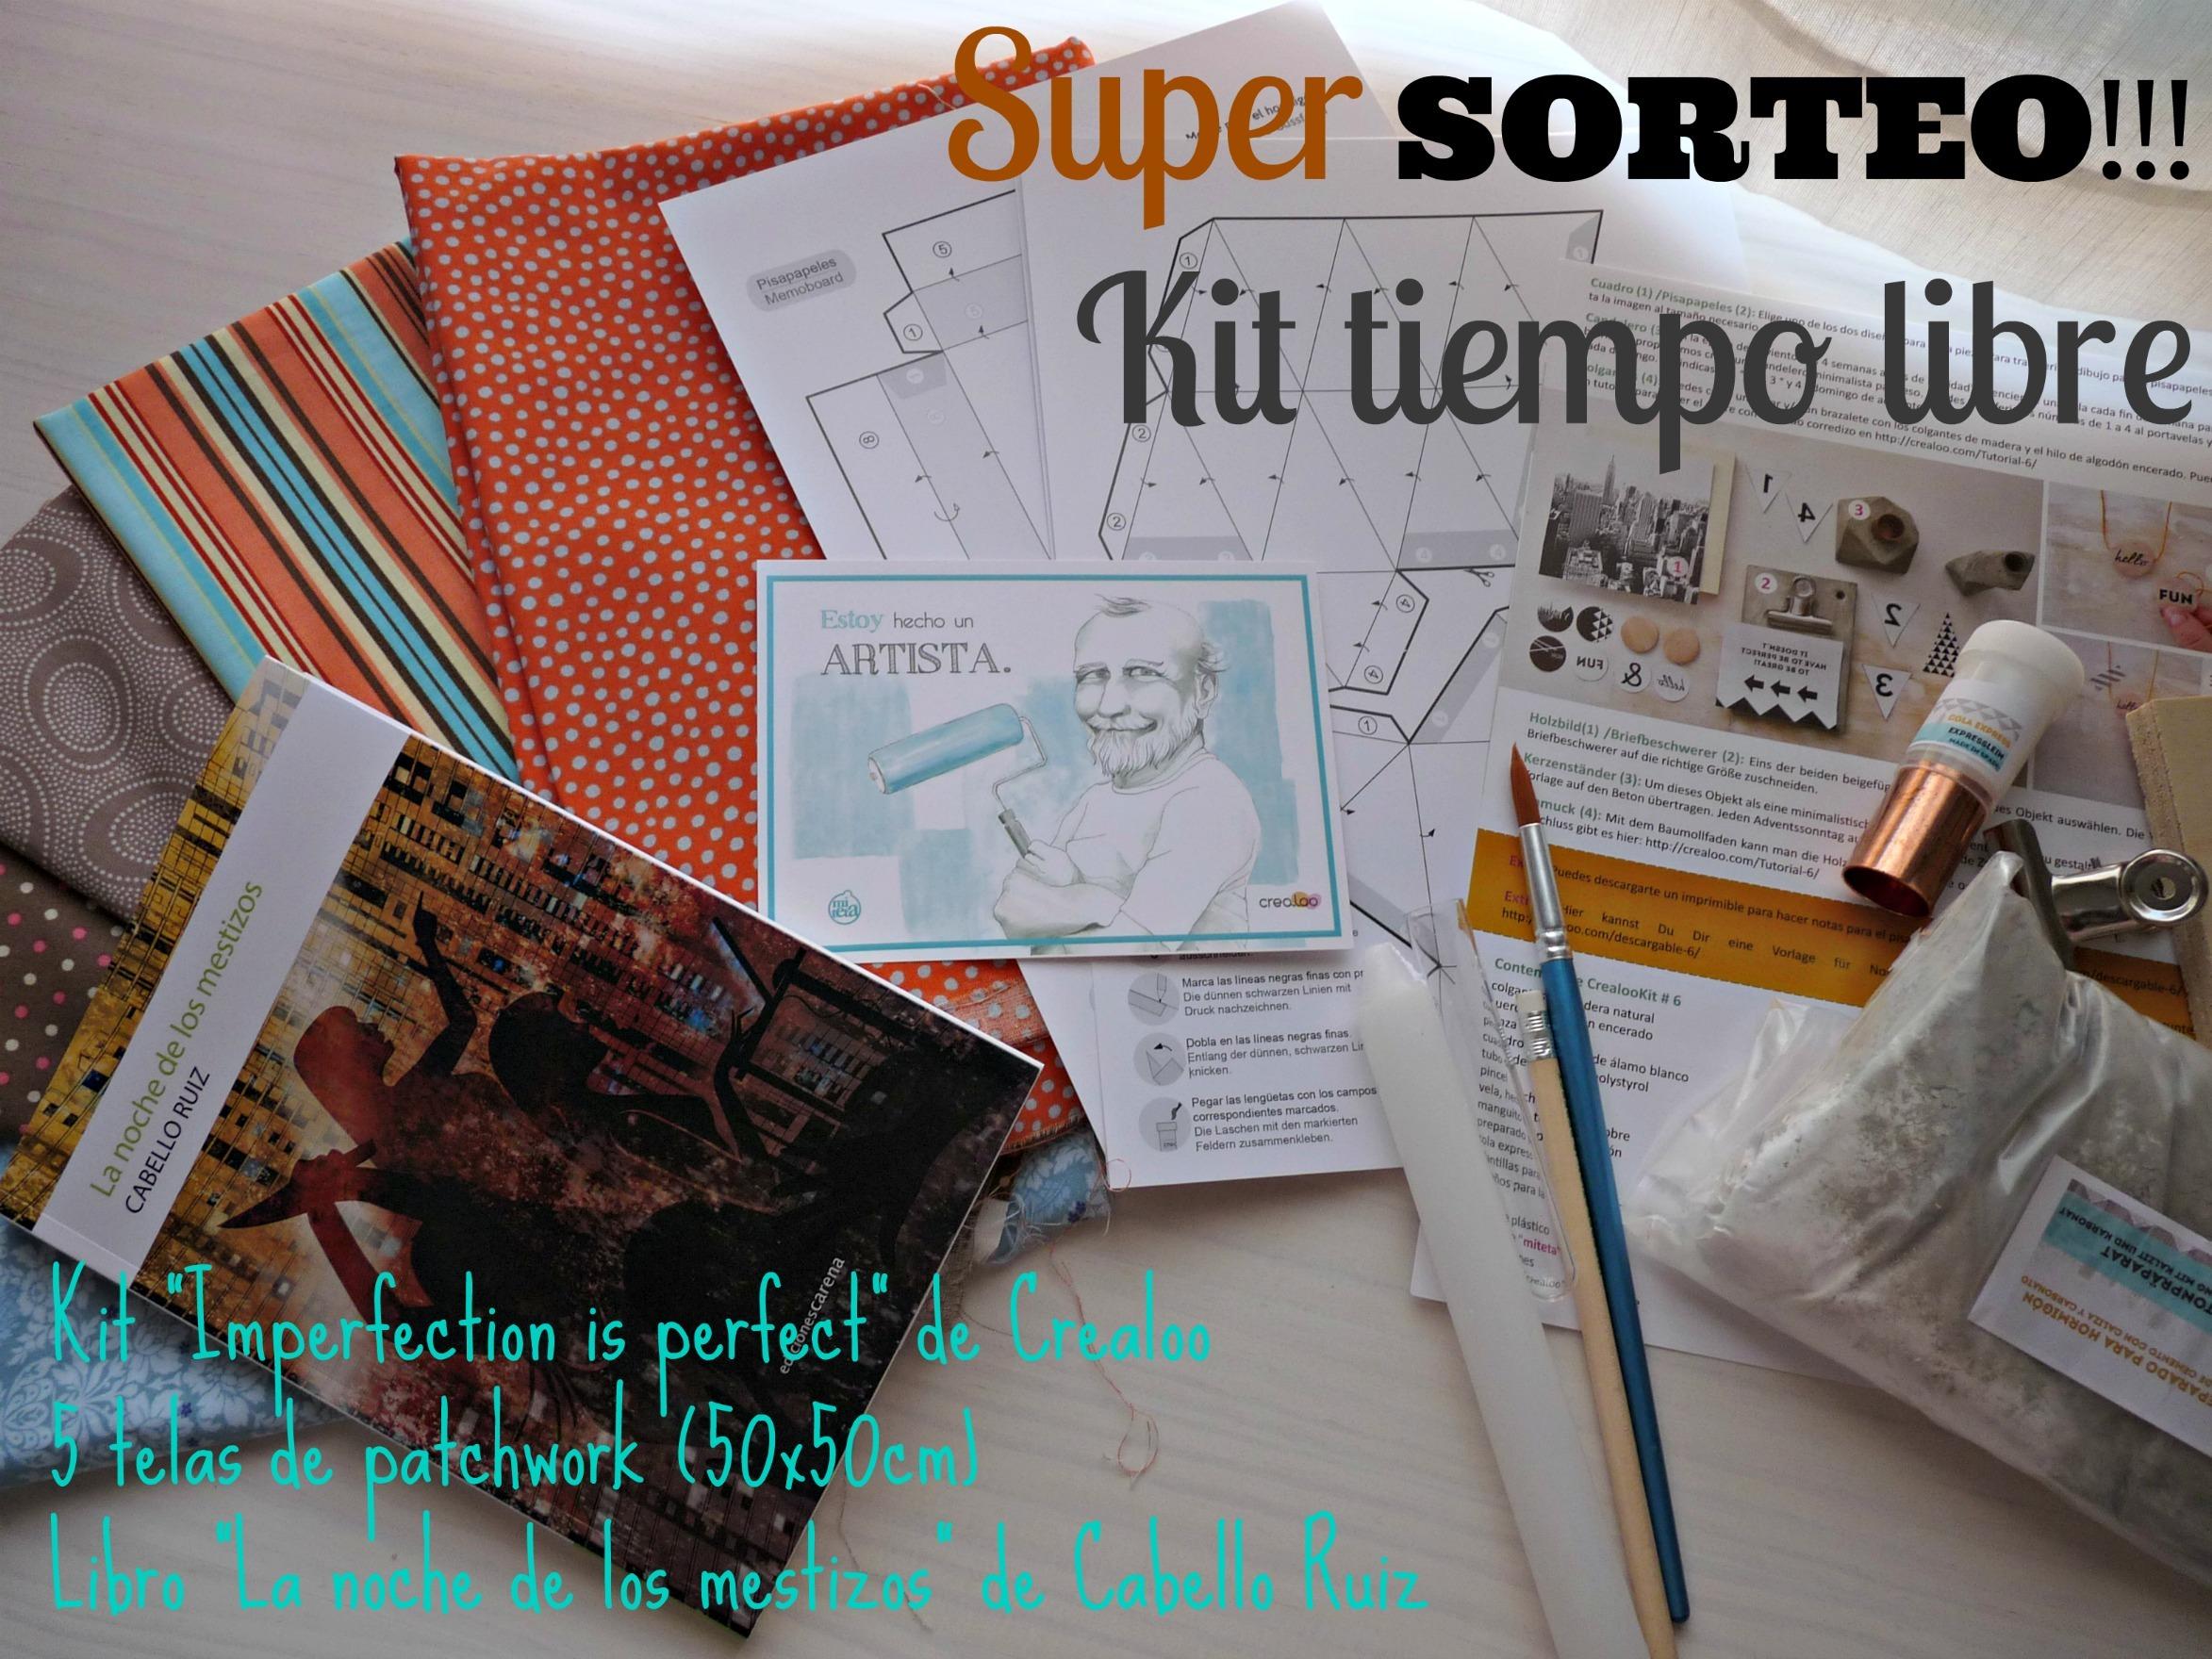 Sorteo lovely and creatiful